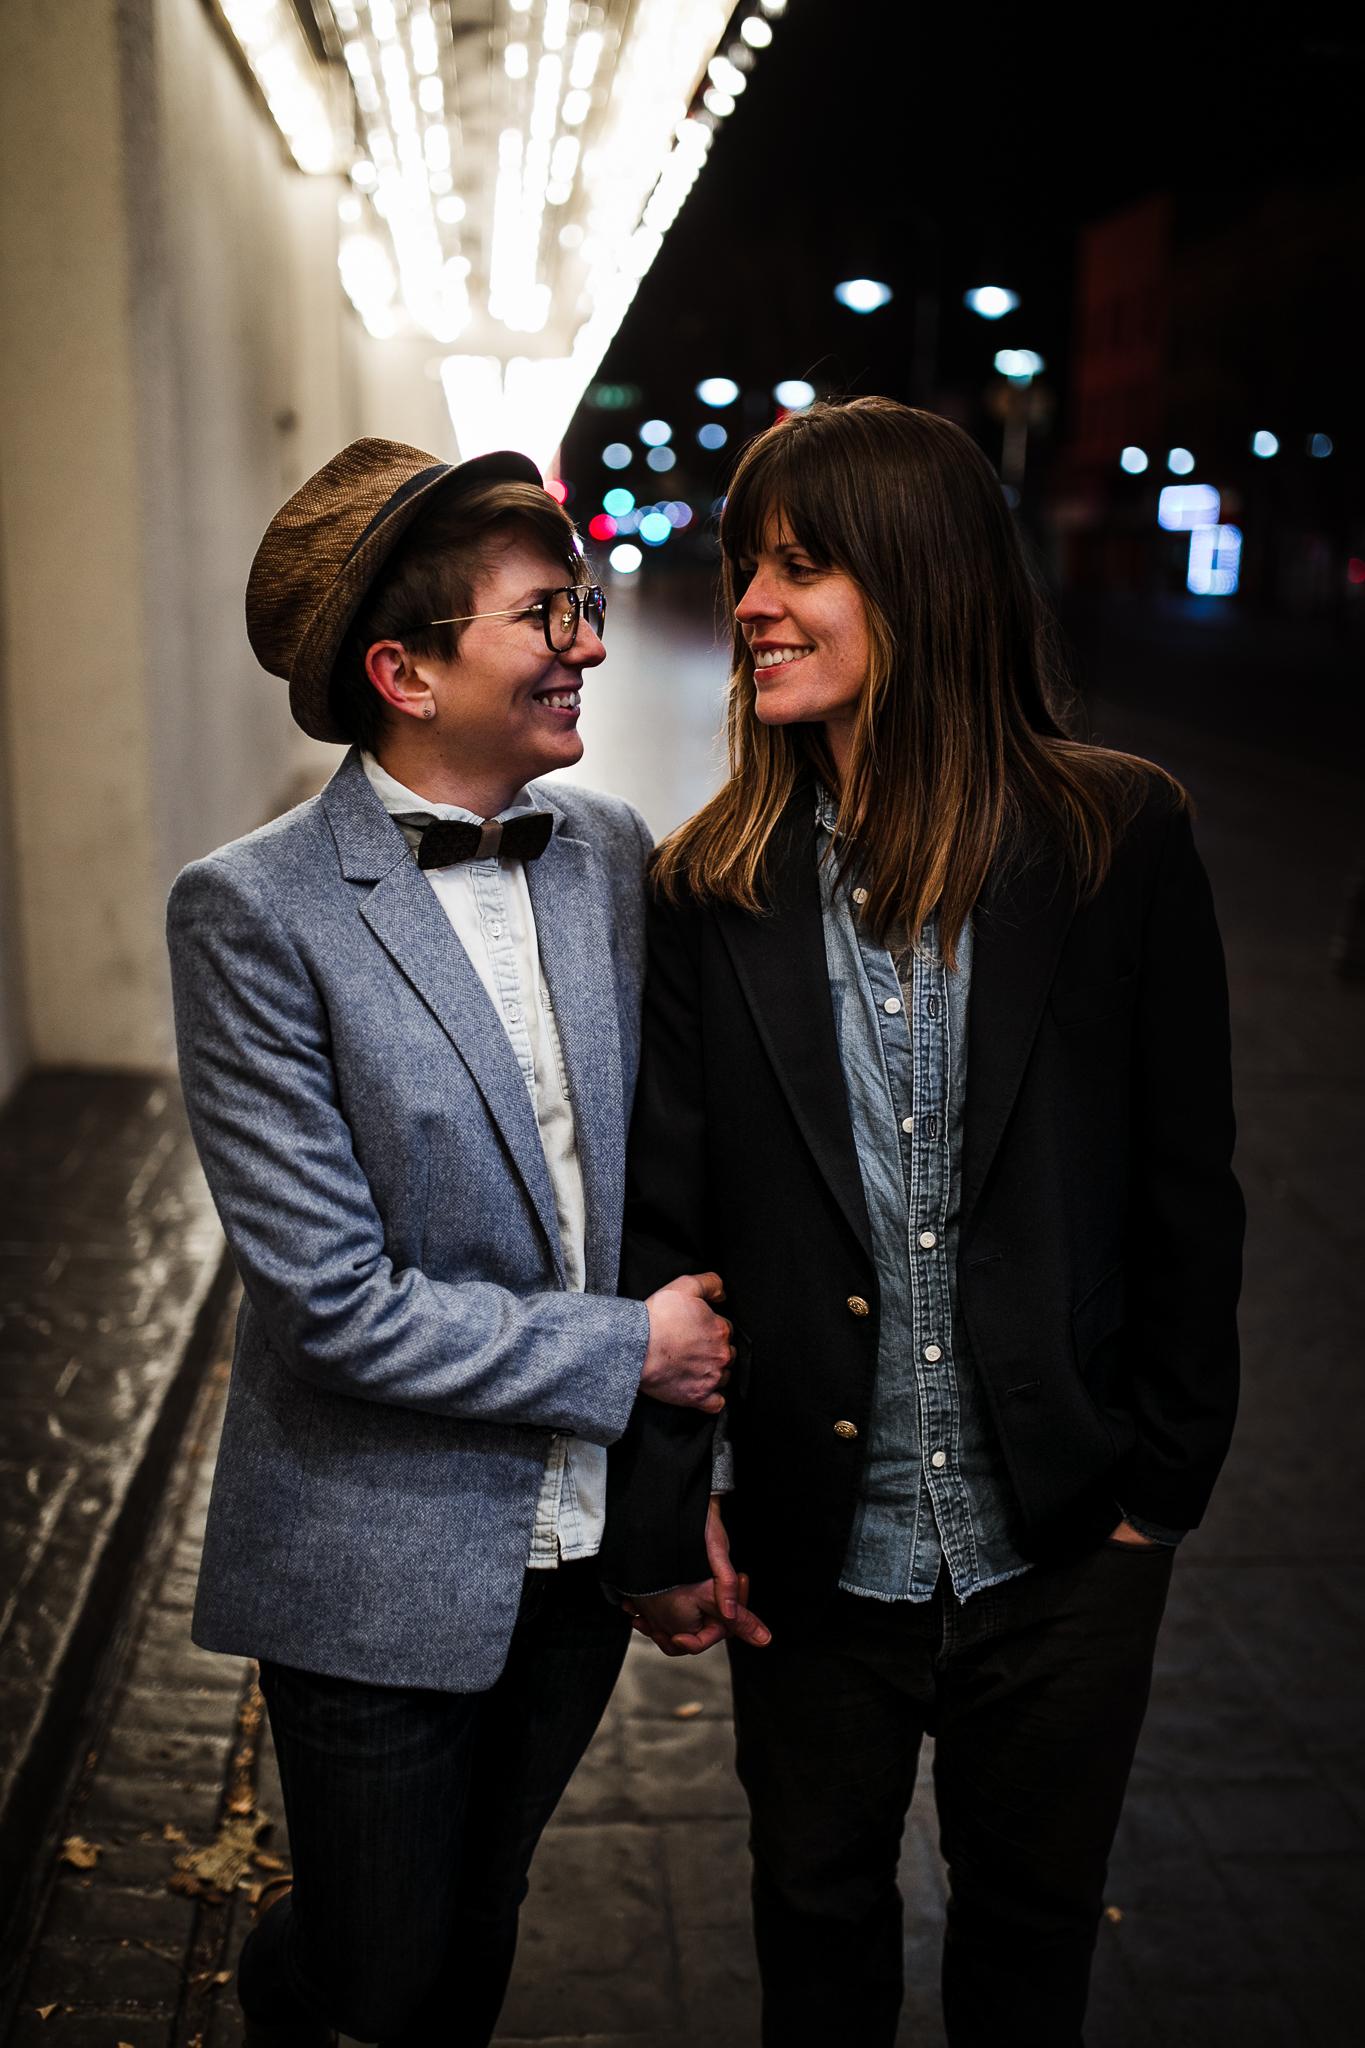 Archer Inspired Photography Hilary and Gia LGTBQ Reno Nevada Couple Wedding Engagement Photographer-14.jpg